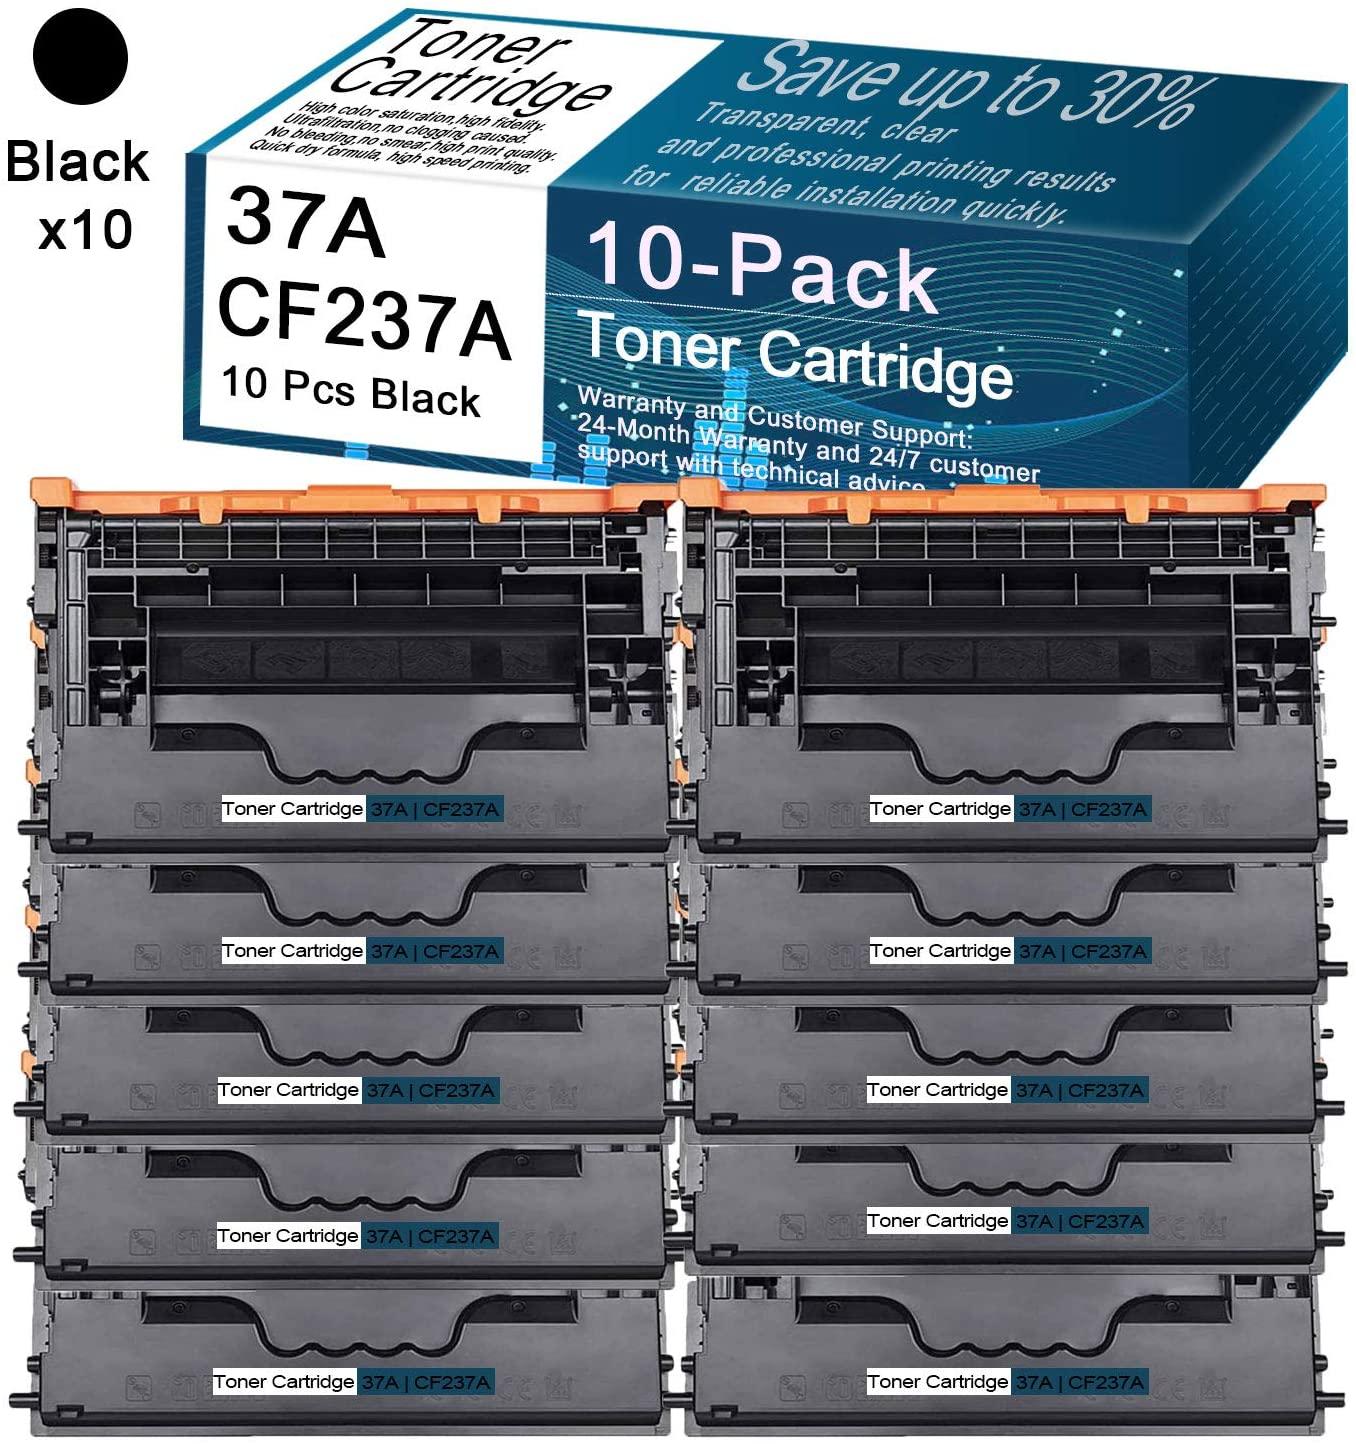 CuToner Compatible Toner Cartridges Replacement 10-Pack Black 37A   CF237A for HP LaserJet Enterprise M607n,M607dn,M608n,M609dn,M609x,M633z,M631 Series,M632 Series,M633 Series Printers Toner Cartridge